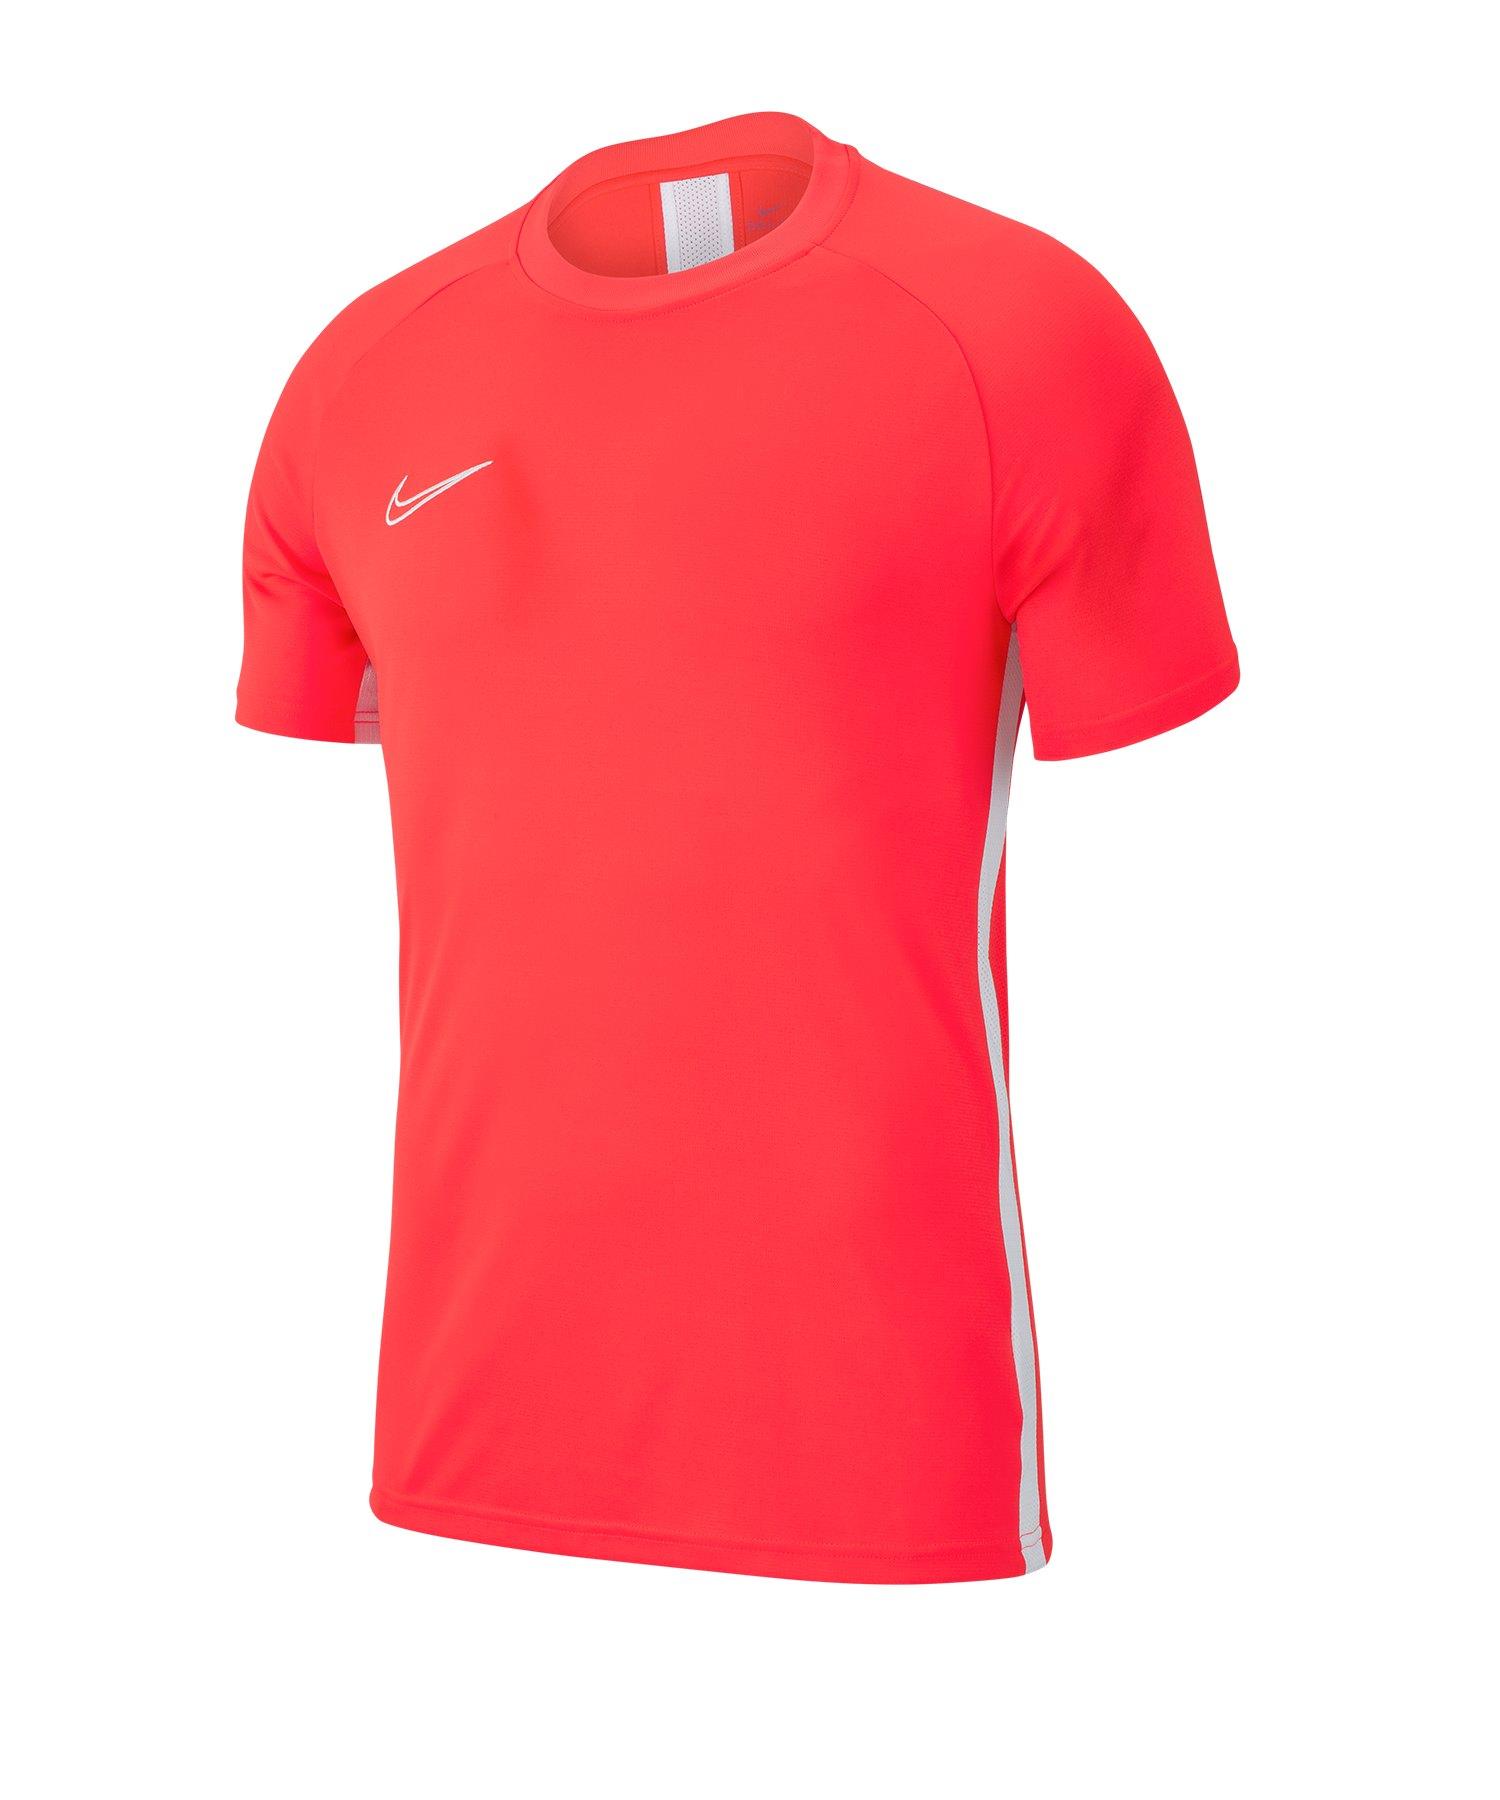 Nike Academy 19 Dri-FIT T-Shirt Kids Rot F671 - rot